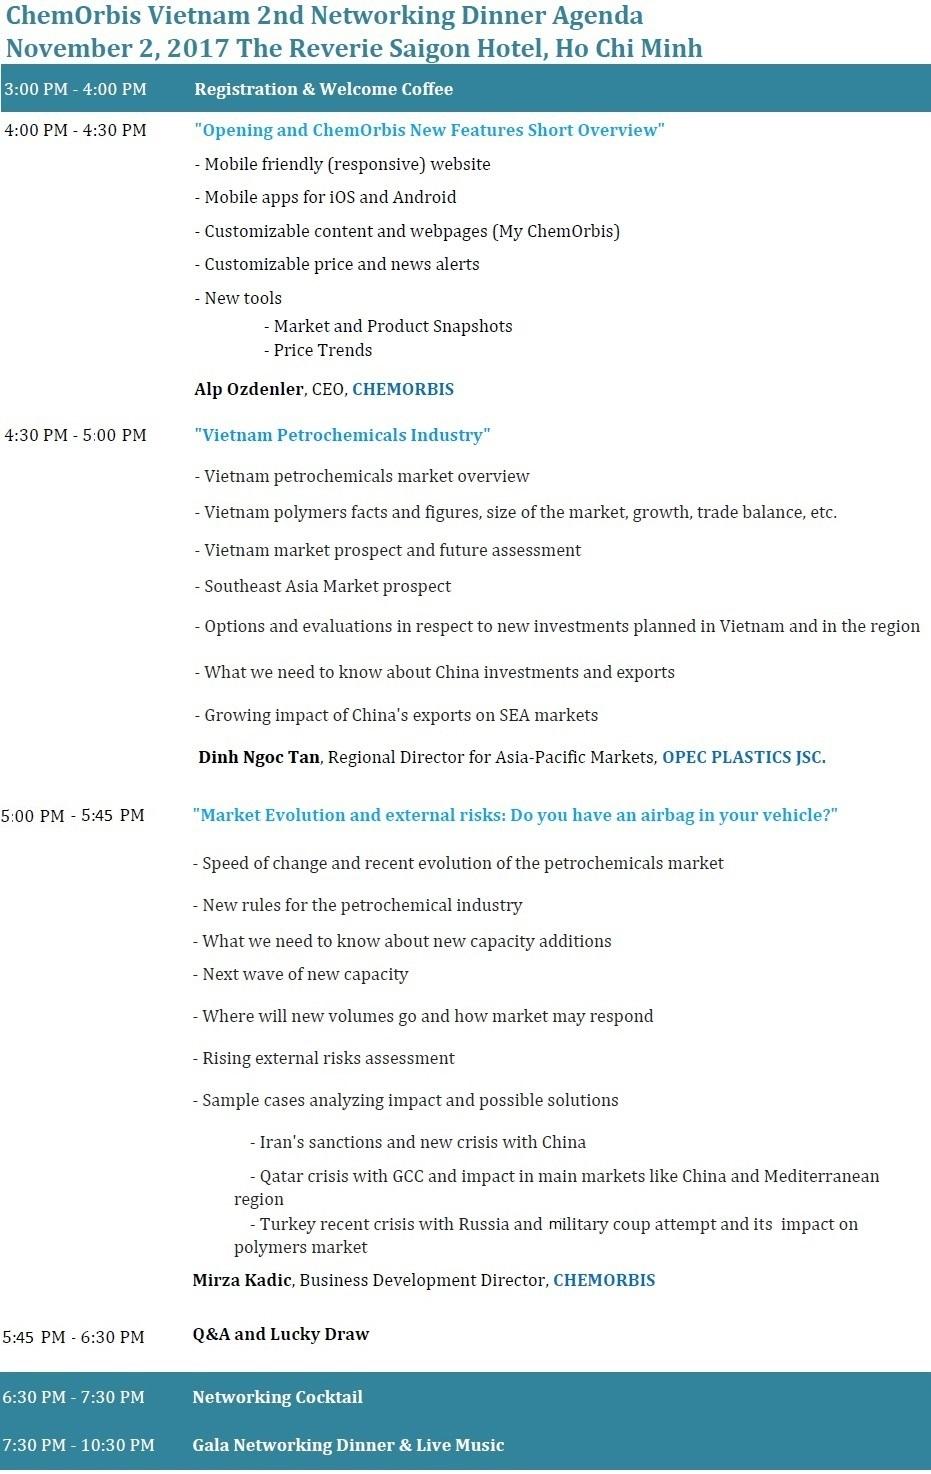 ChemOrbis_Vietnam_2nd_Networking_Agenda.jpg